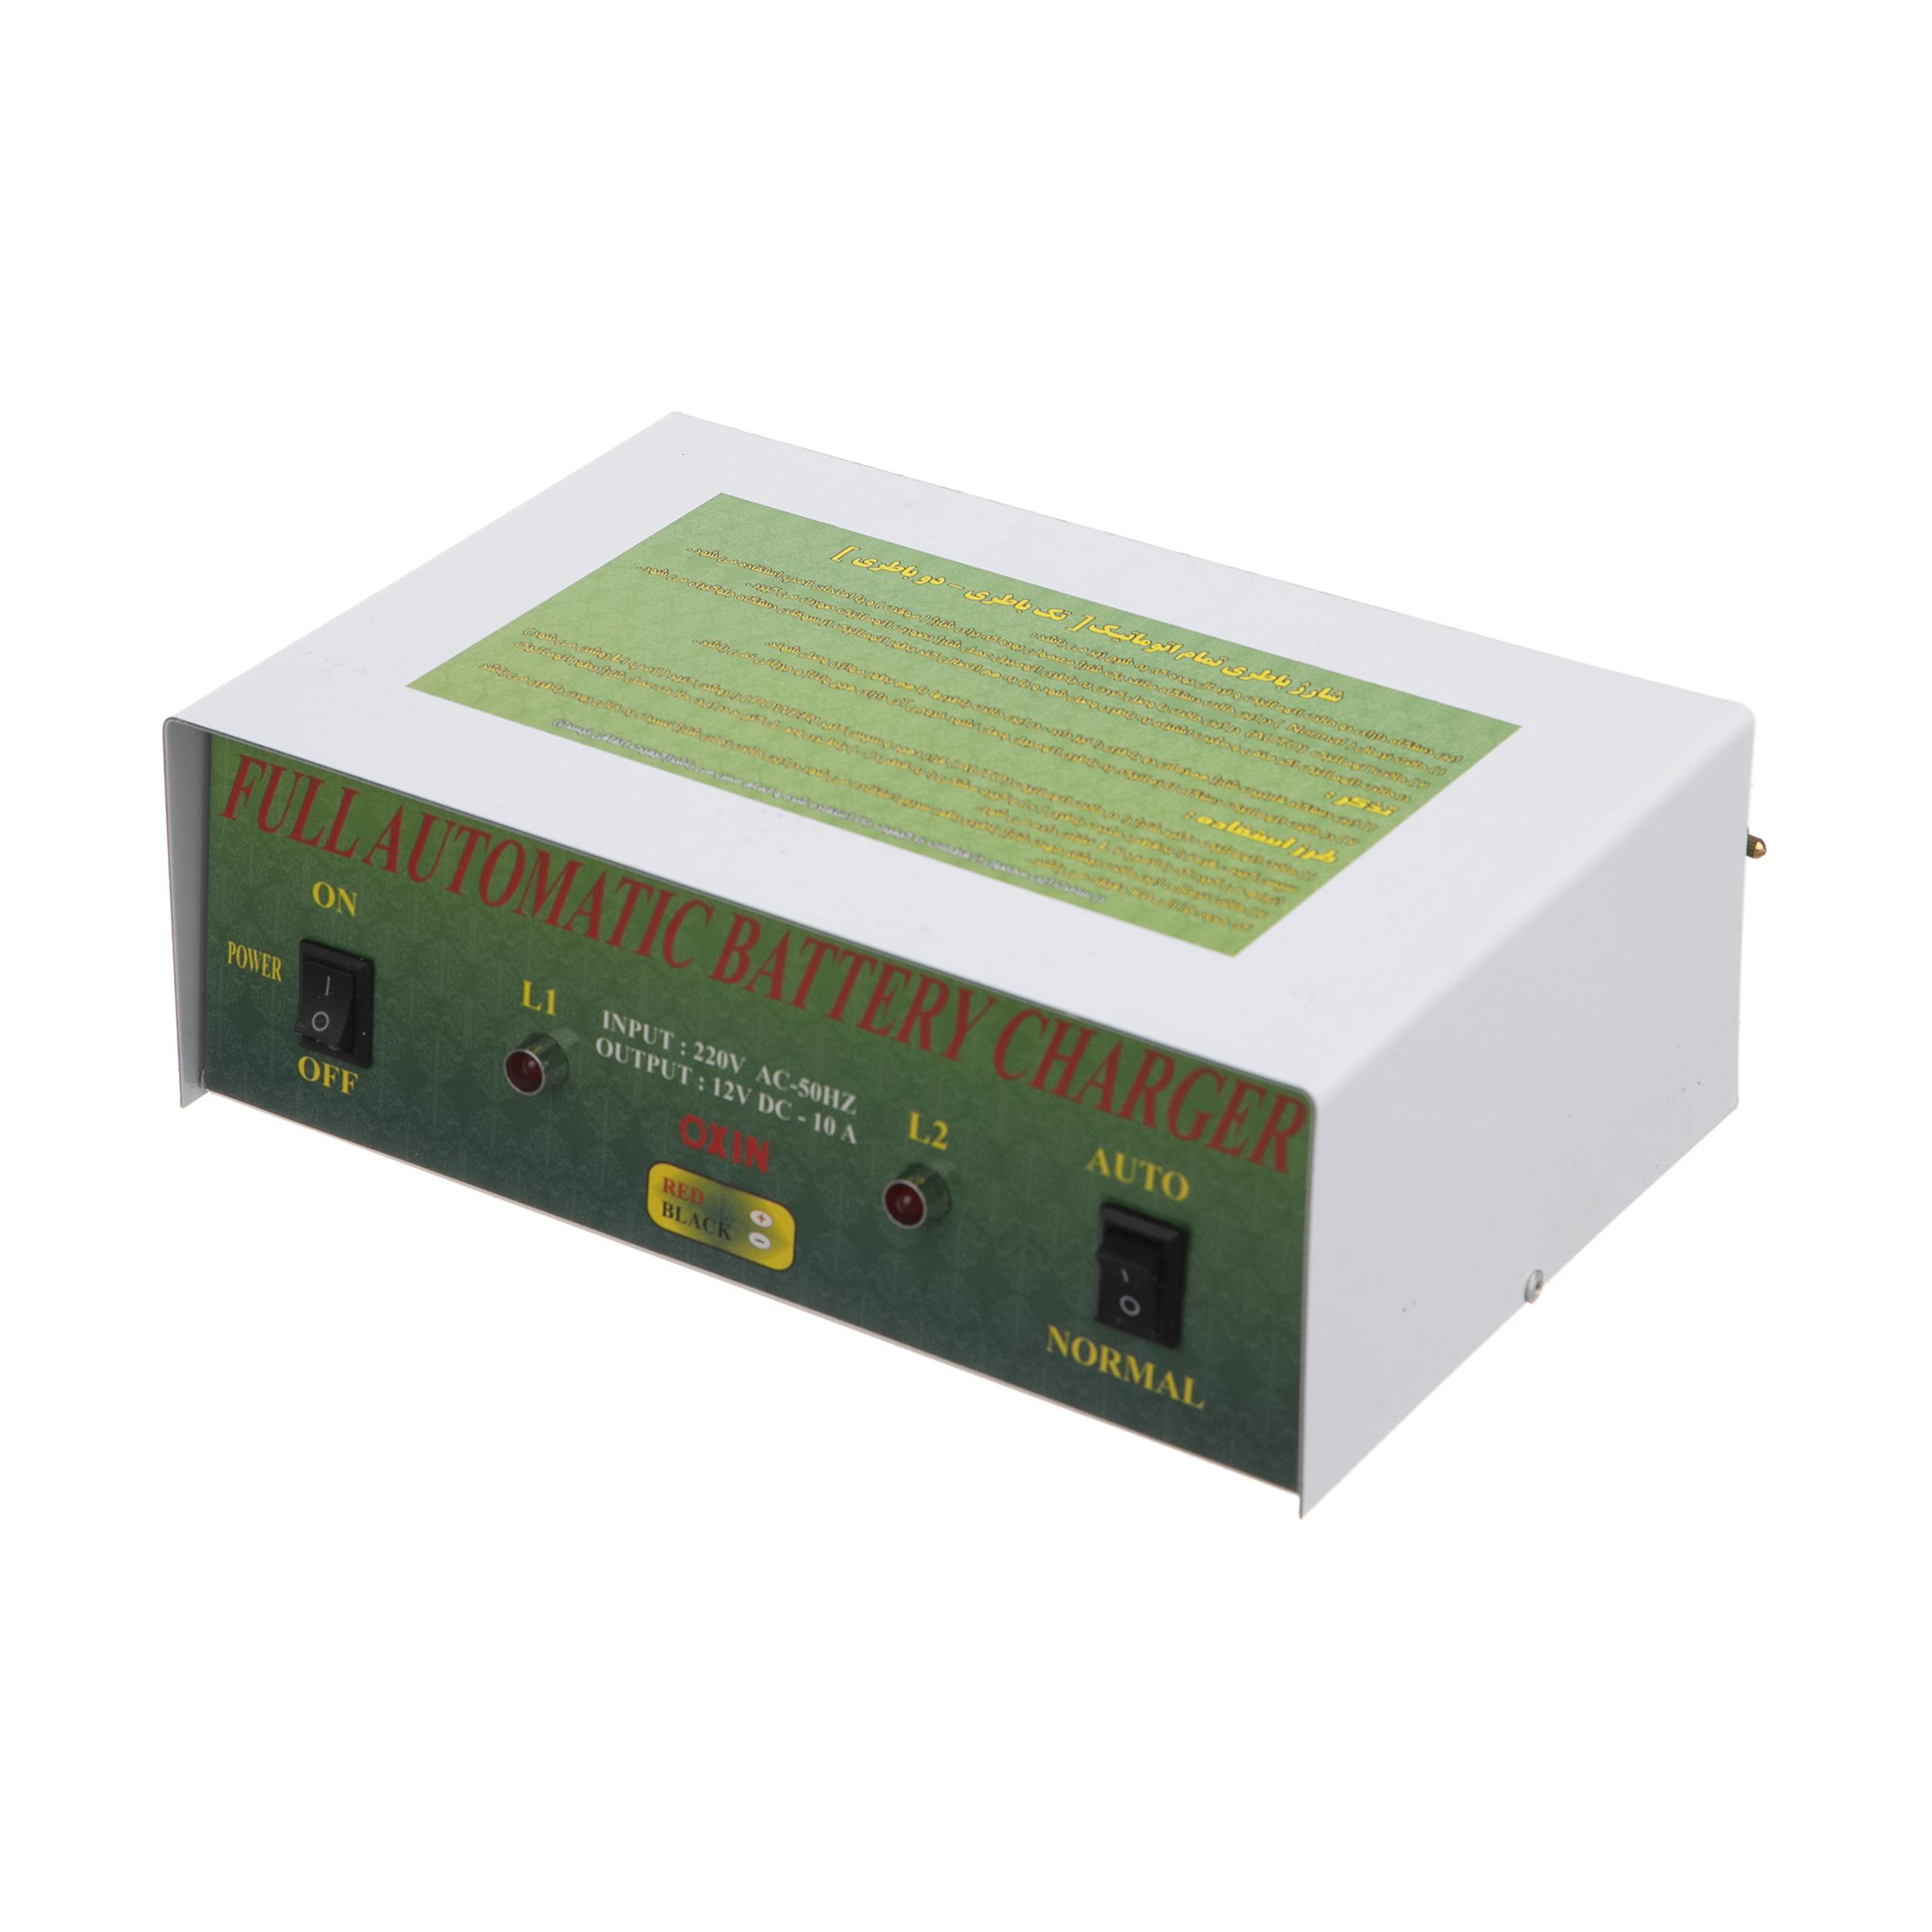 شارژر باتری خودرو اکسین کد AU001